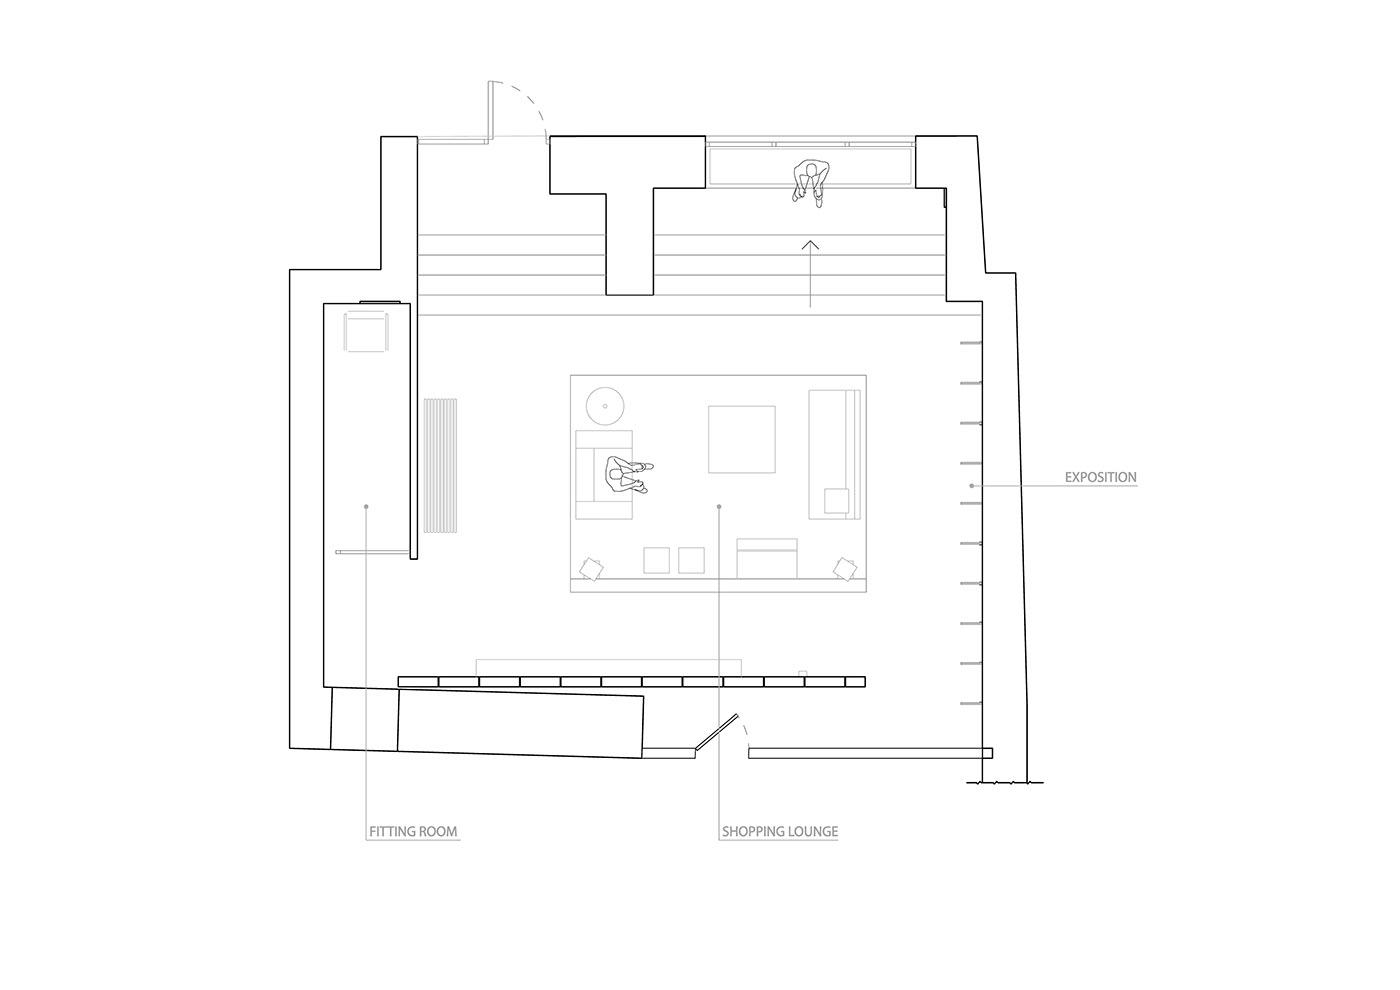 balbek Balbek Bureau commercial design custom design Interior Architecture interior design  interior inspiration interiors modern interior retail interior